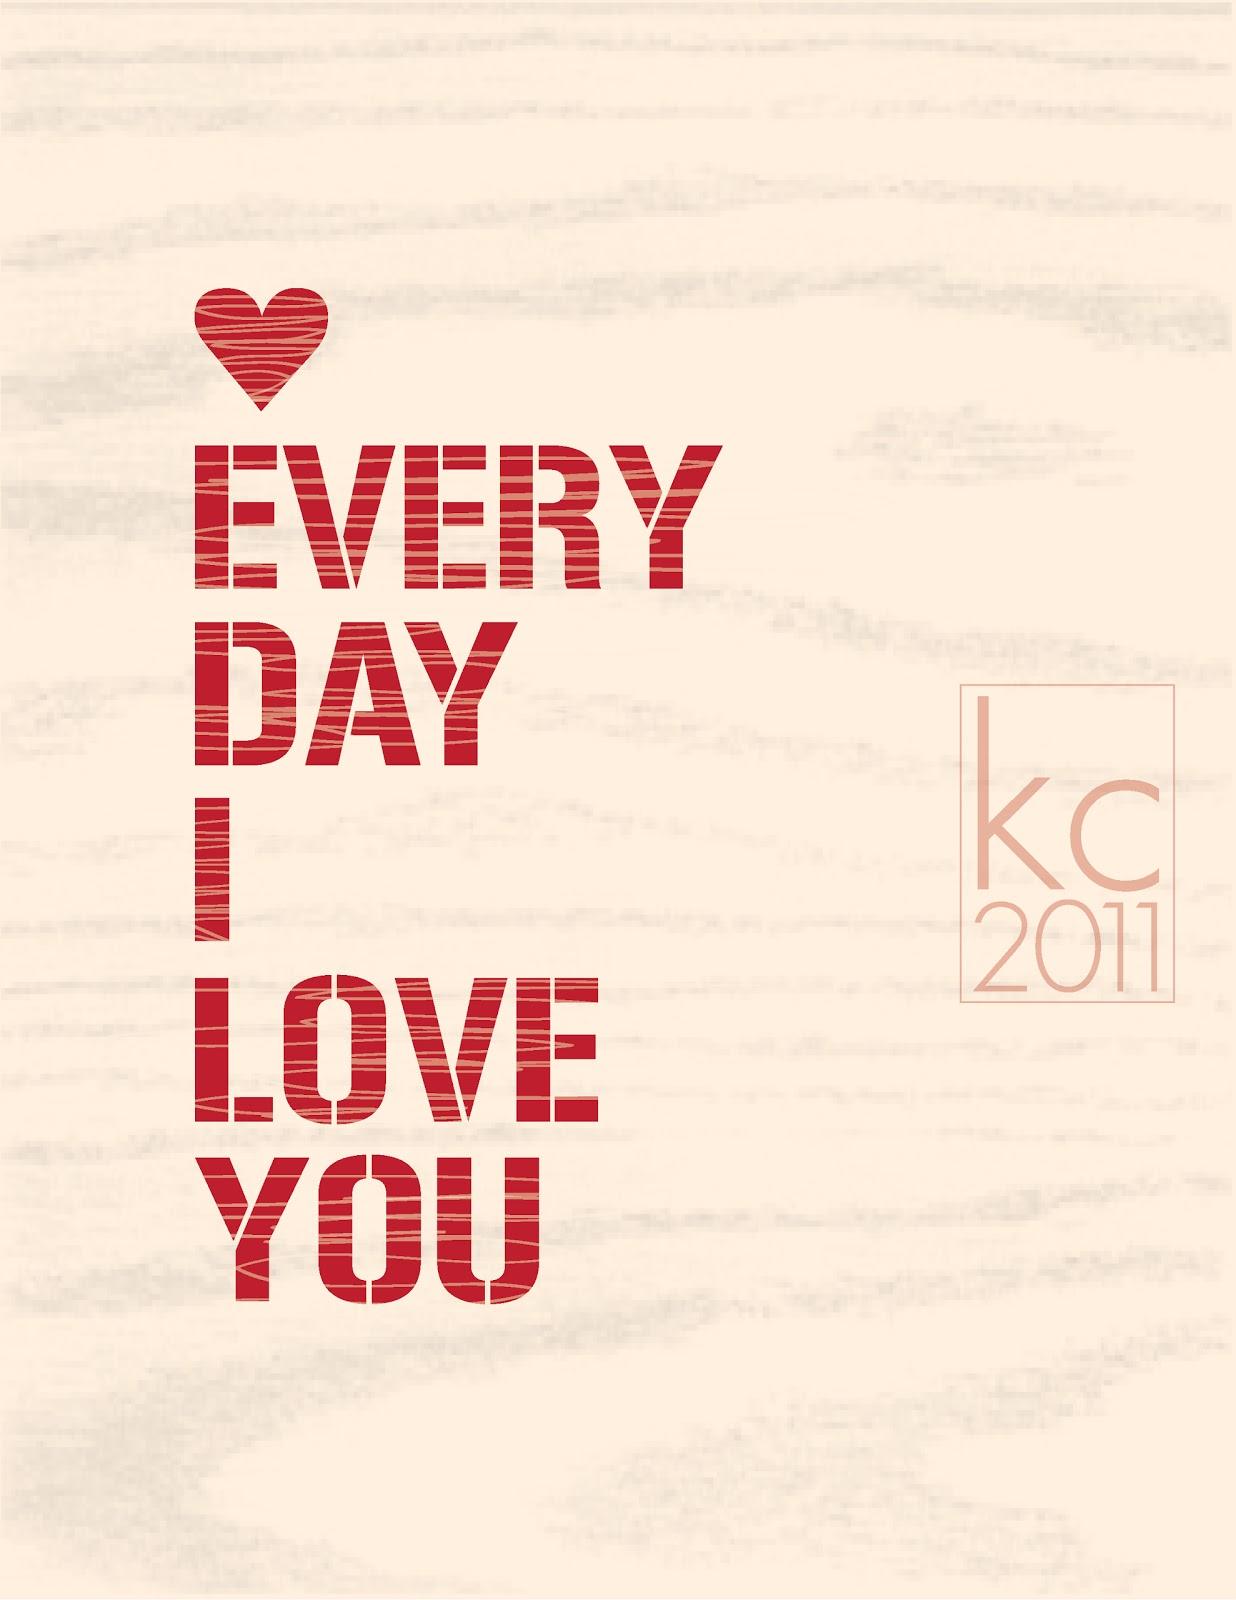 http://i0.wp.com/3.bp.blogspot.com/_VY0iaSojtkU/TSTcIESzNKI/AAAAAAAAGRQ/T0_d4FsyYWk/s1600/every+day+i+love+you.jpg?resize=411%2C533